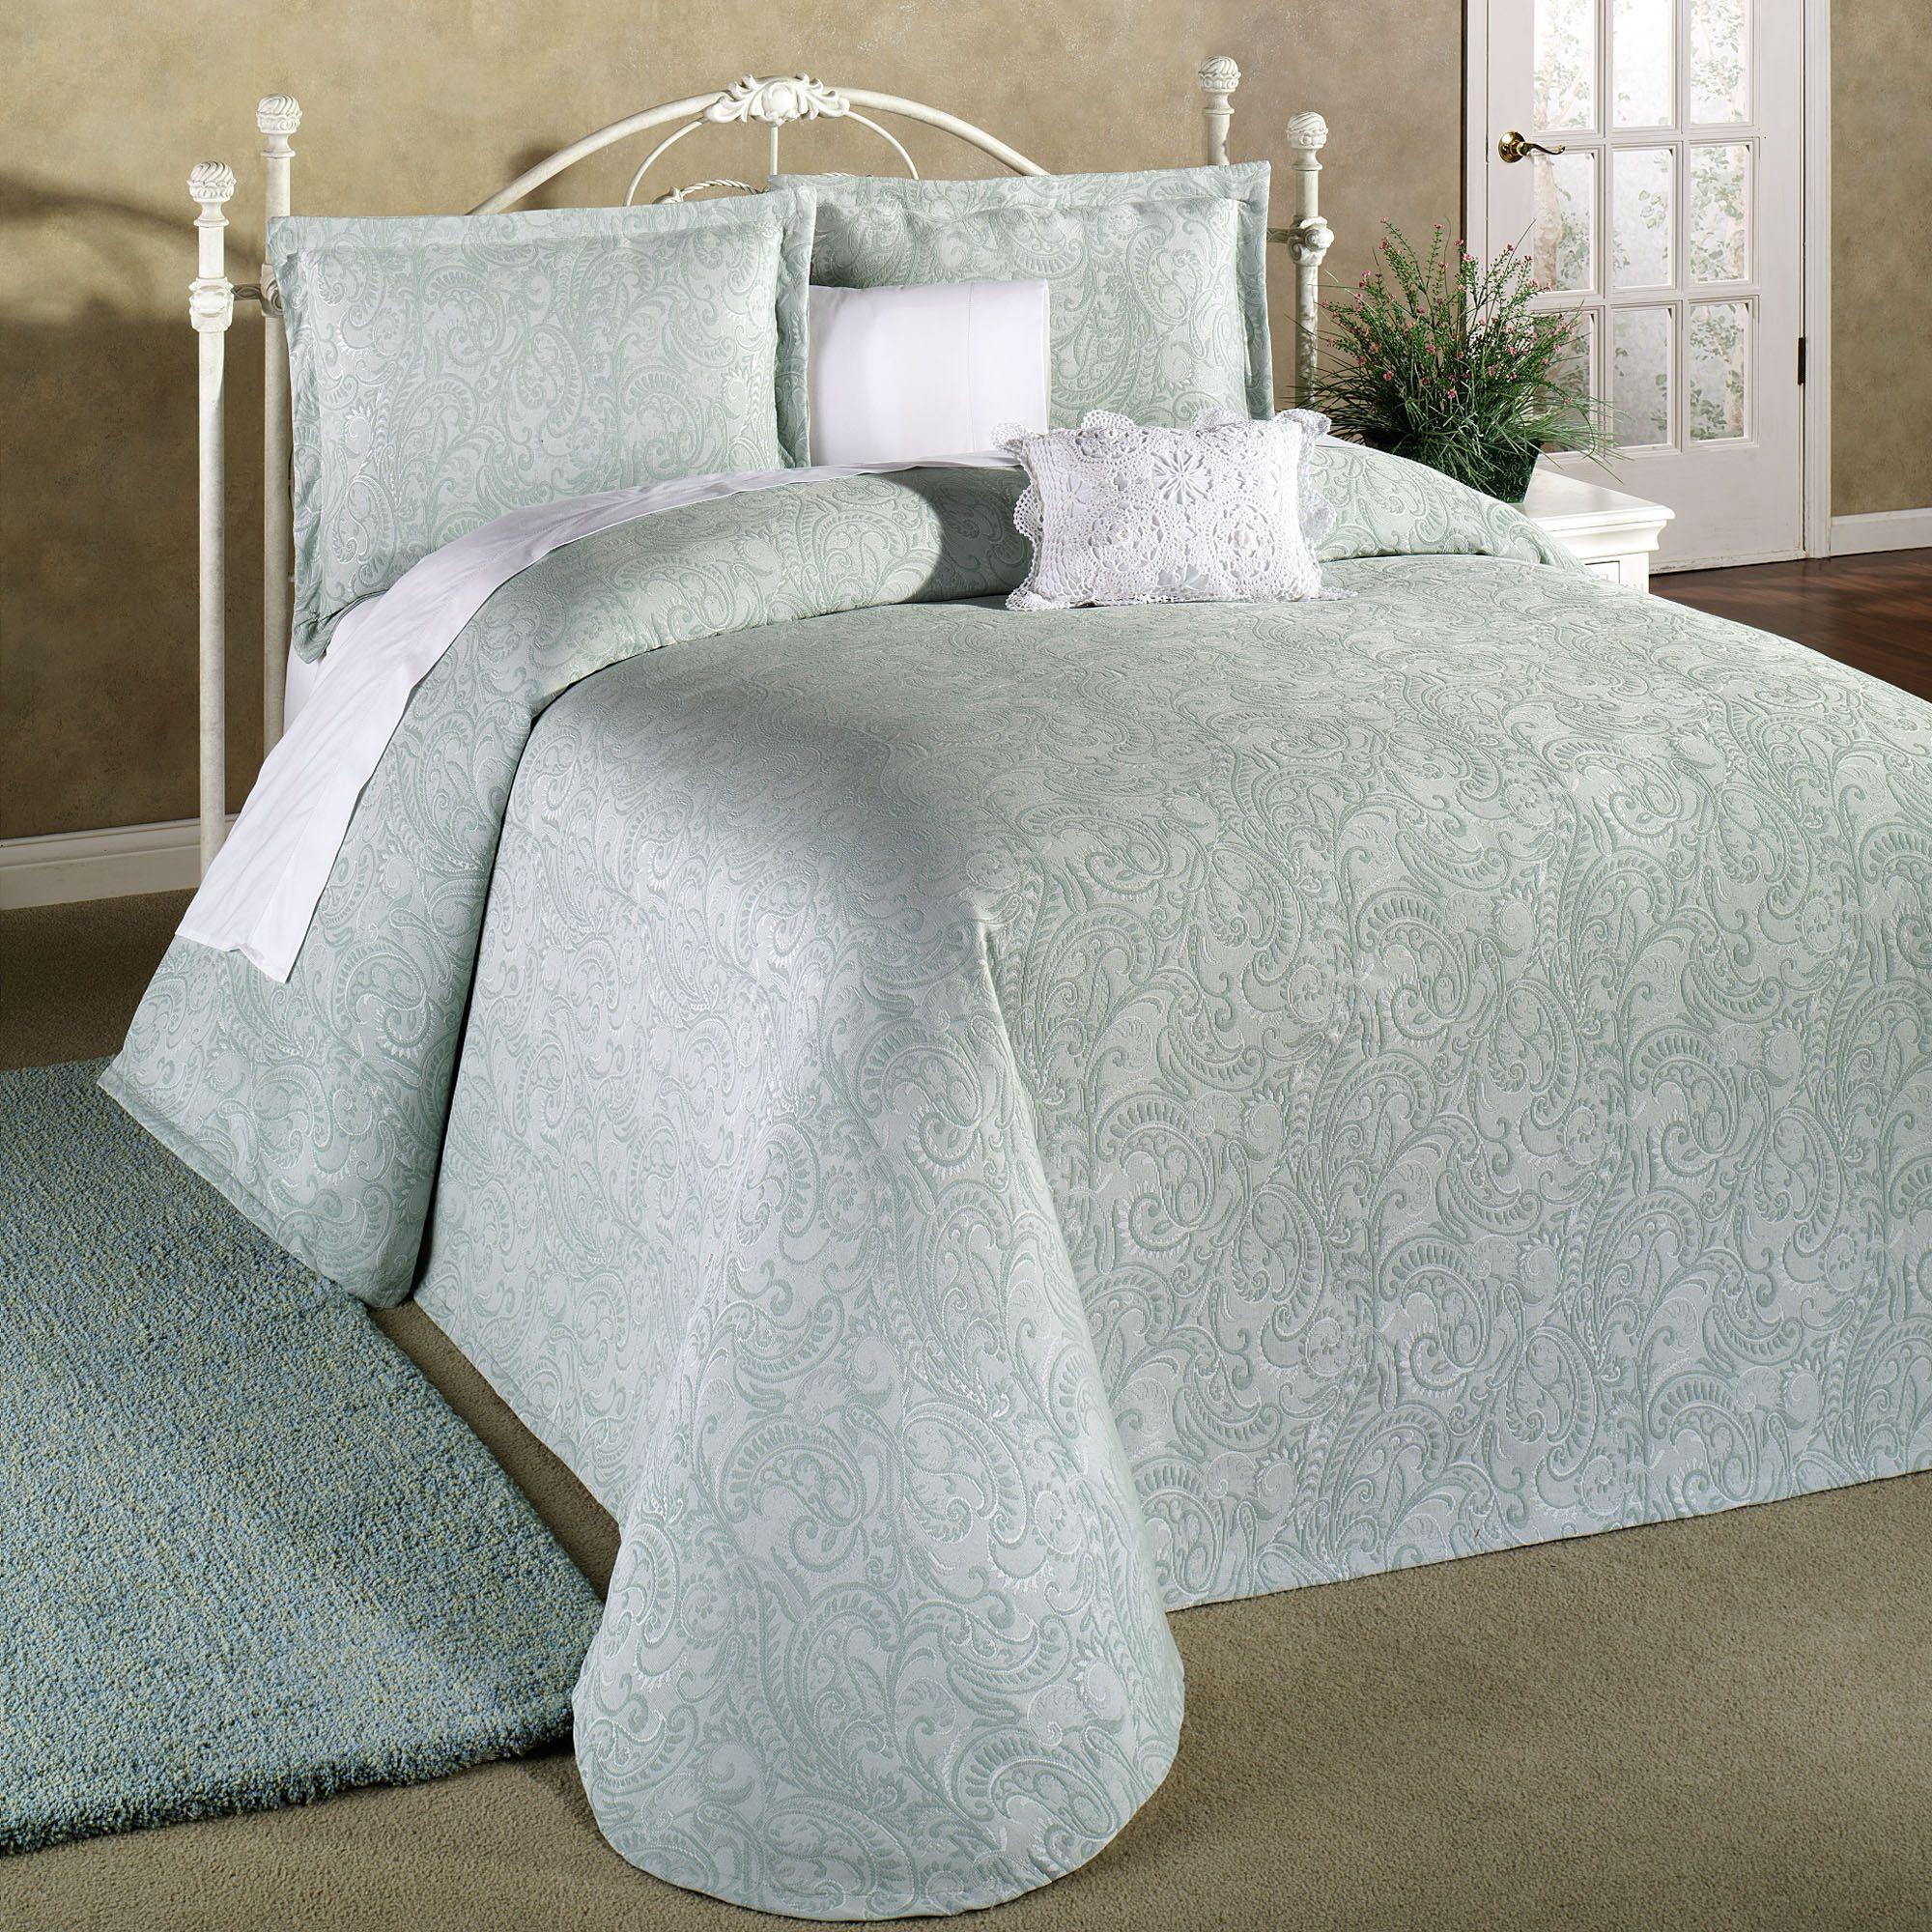 Provence Lightweight Matelasse Bedspread Bedding